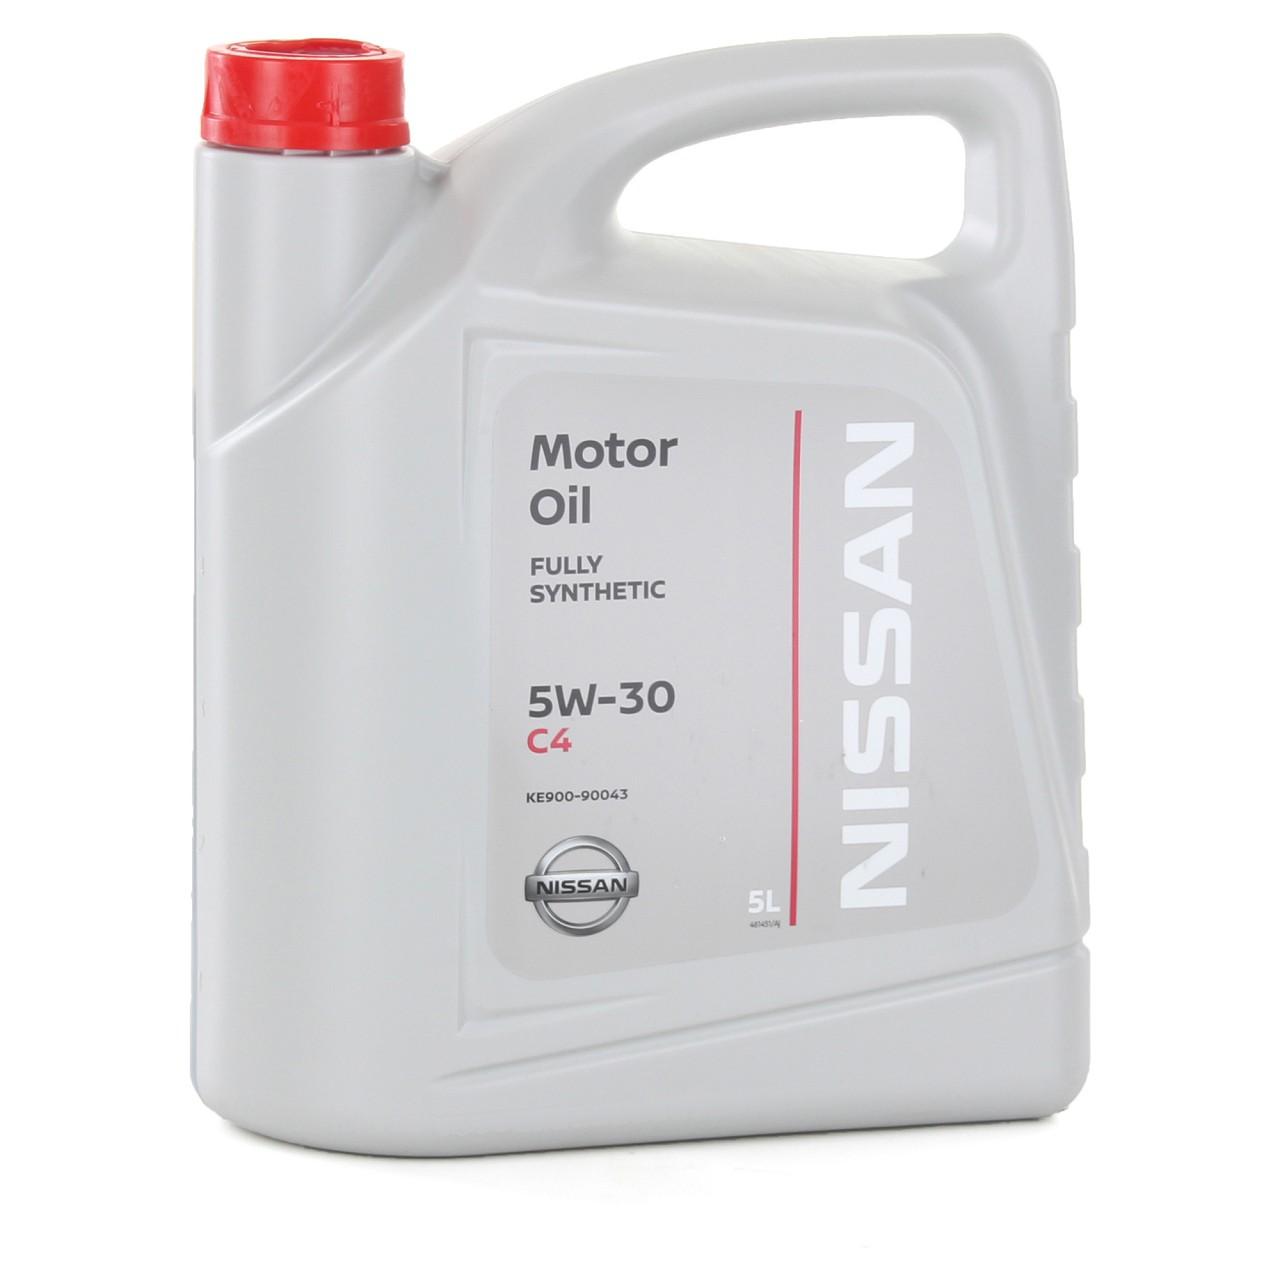 Original NISSAN 5W-30 Motoröl 5W30 DPF ACEA C4 DIESEL 5 Liter 5L KE900-90043